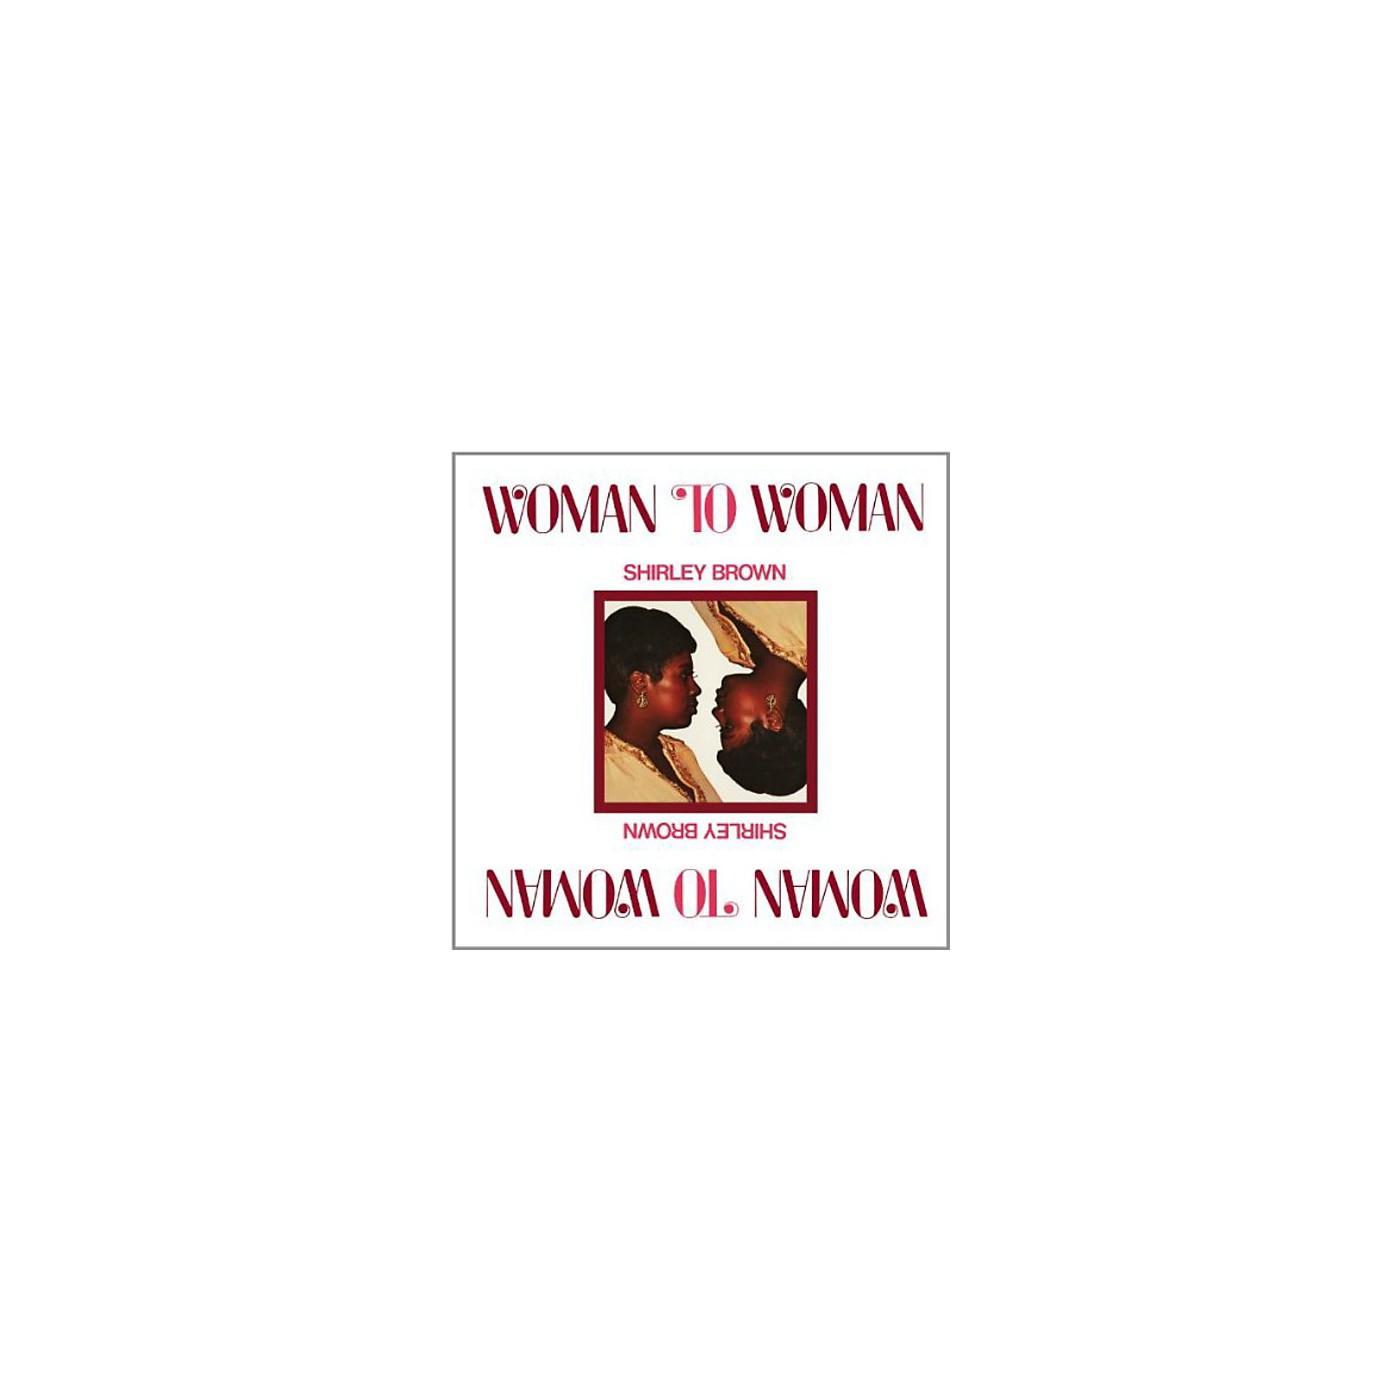 Alliance Shirley Brown - Woman to Woman thumbnail